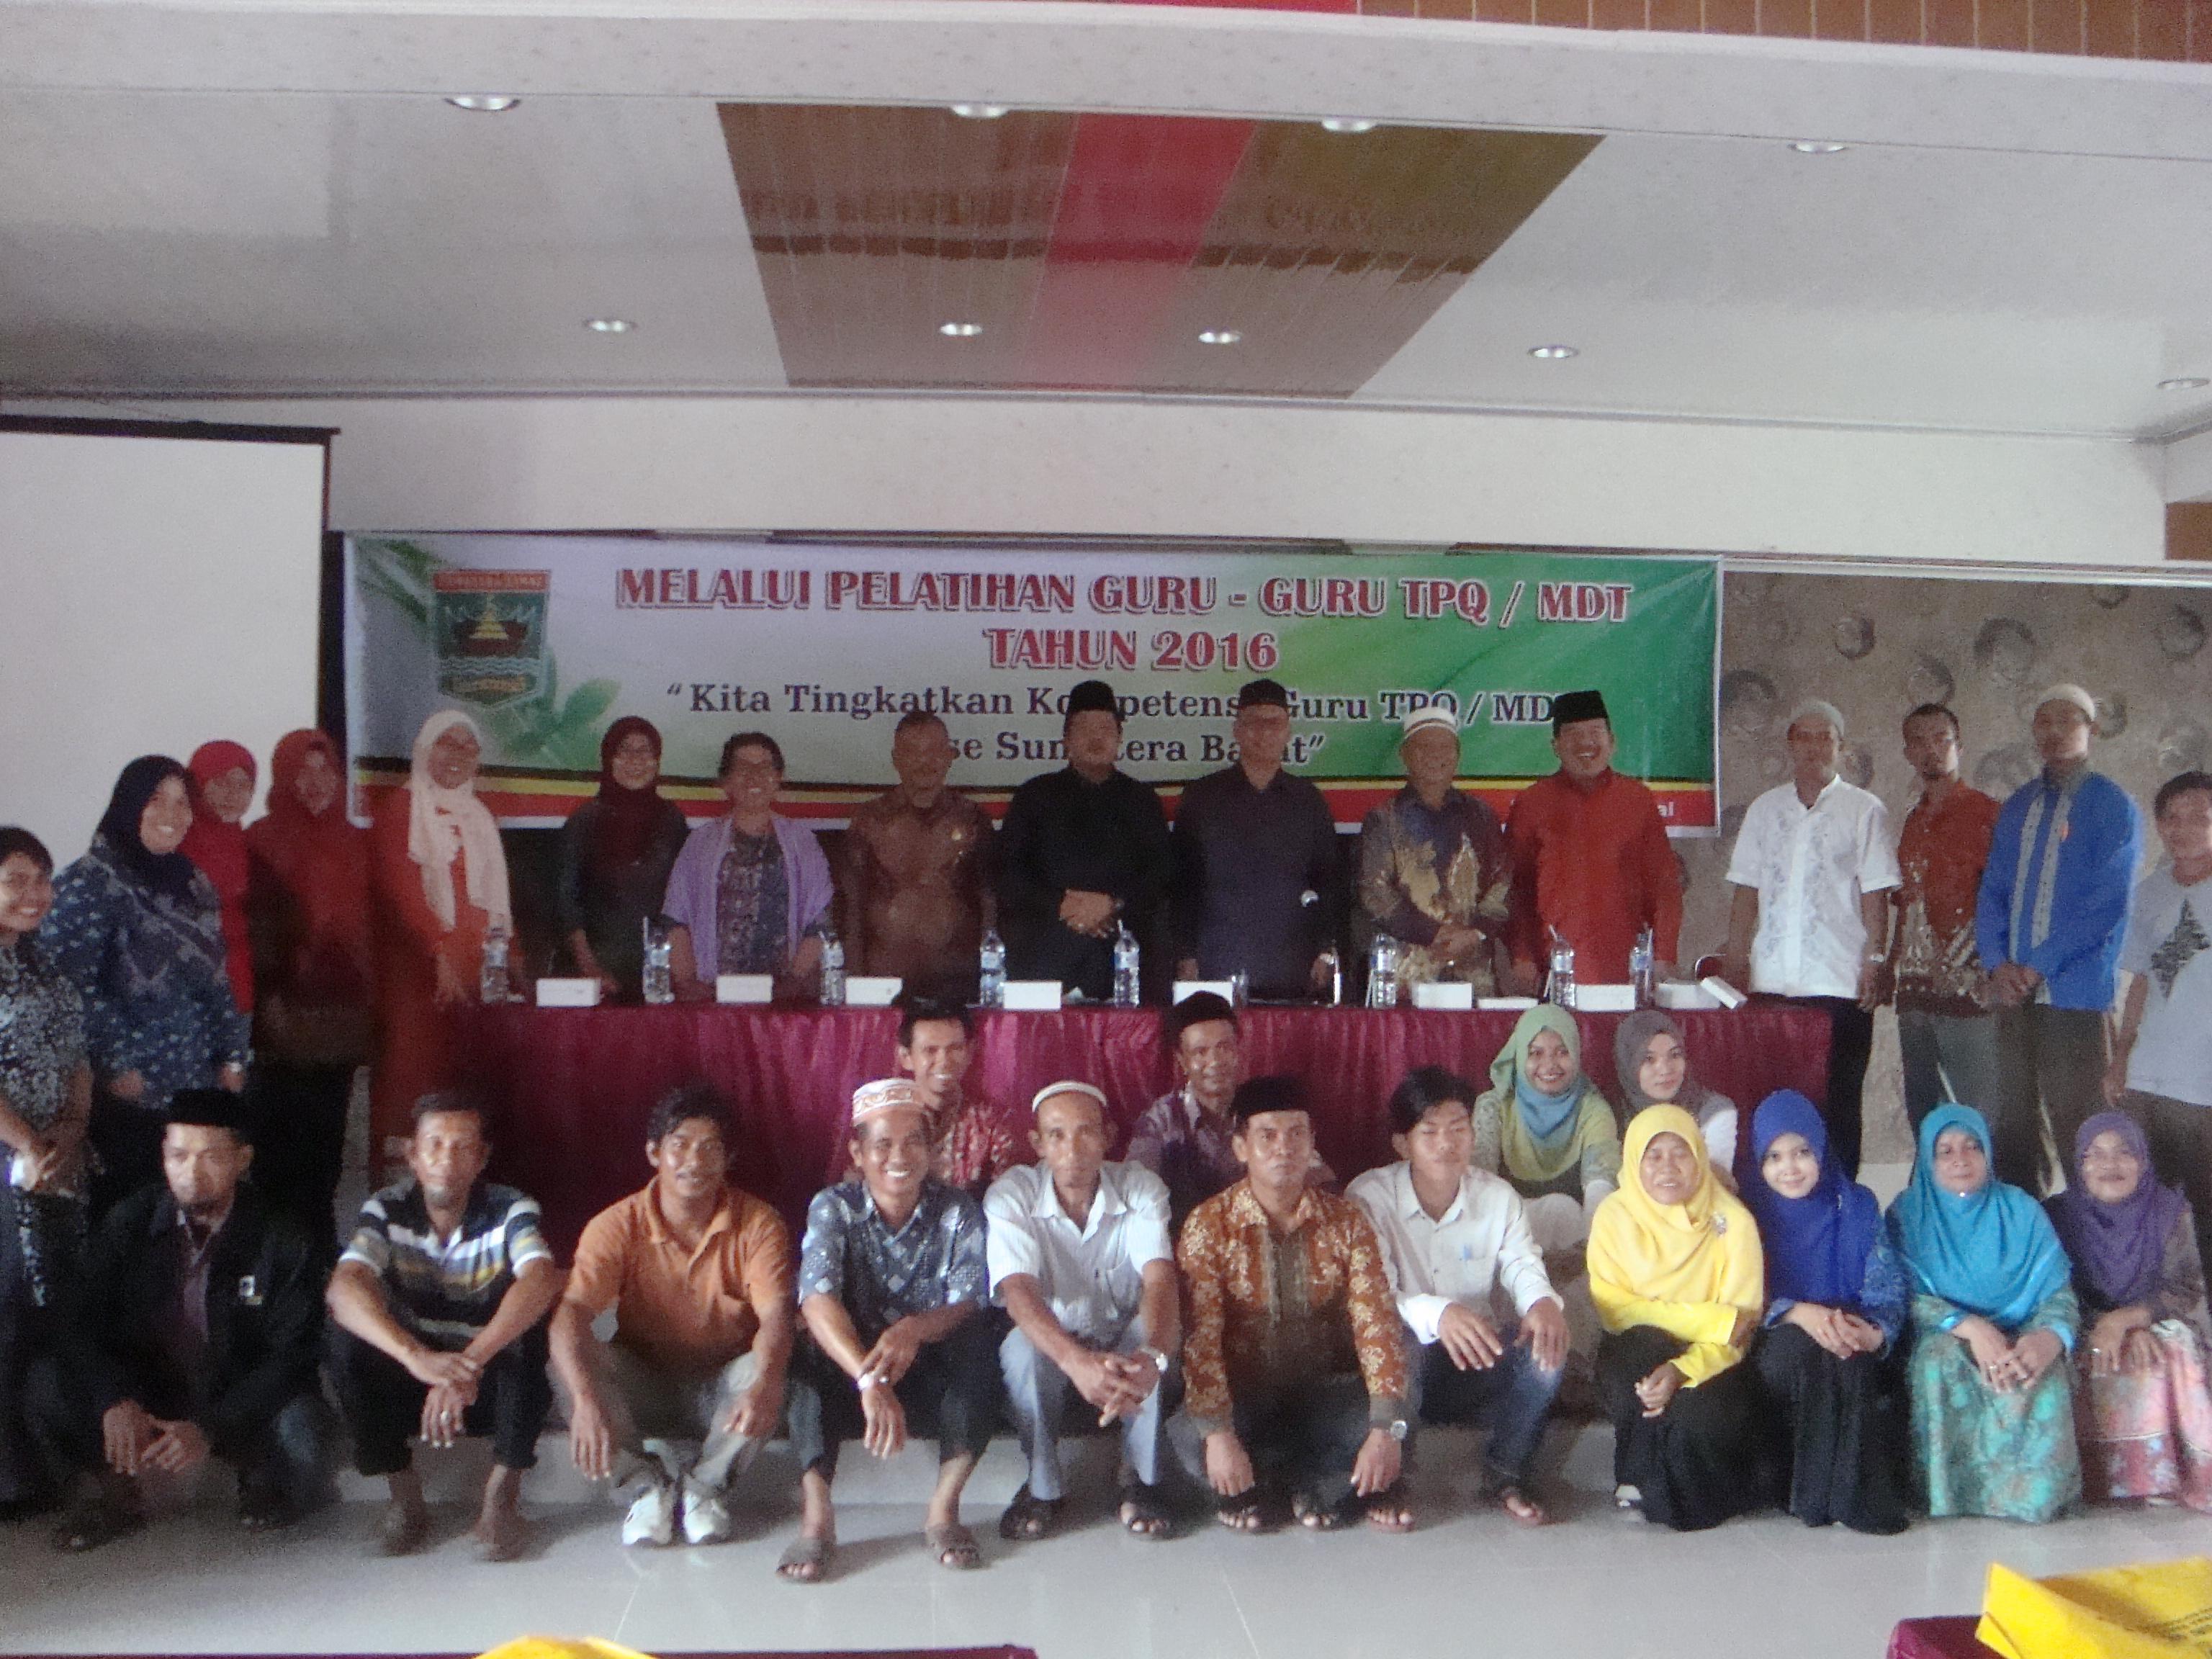 Pelatihan Guru TPQ/MDT di Kepulauan Mentawai Tahun 2016